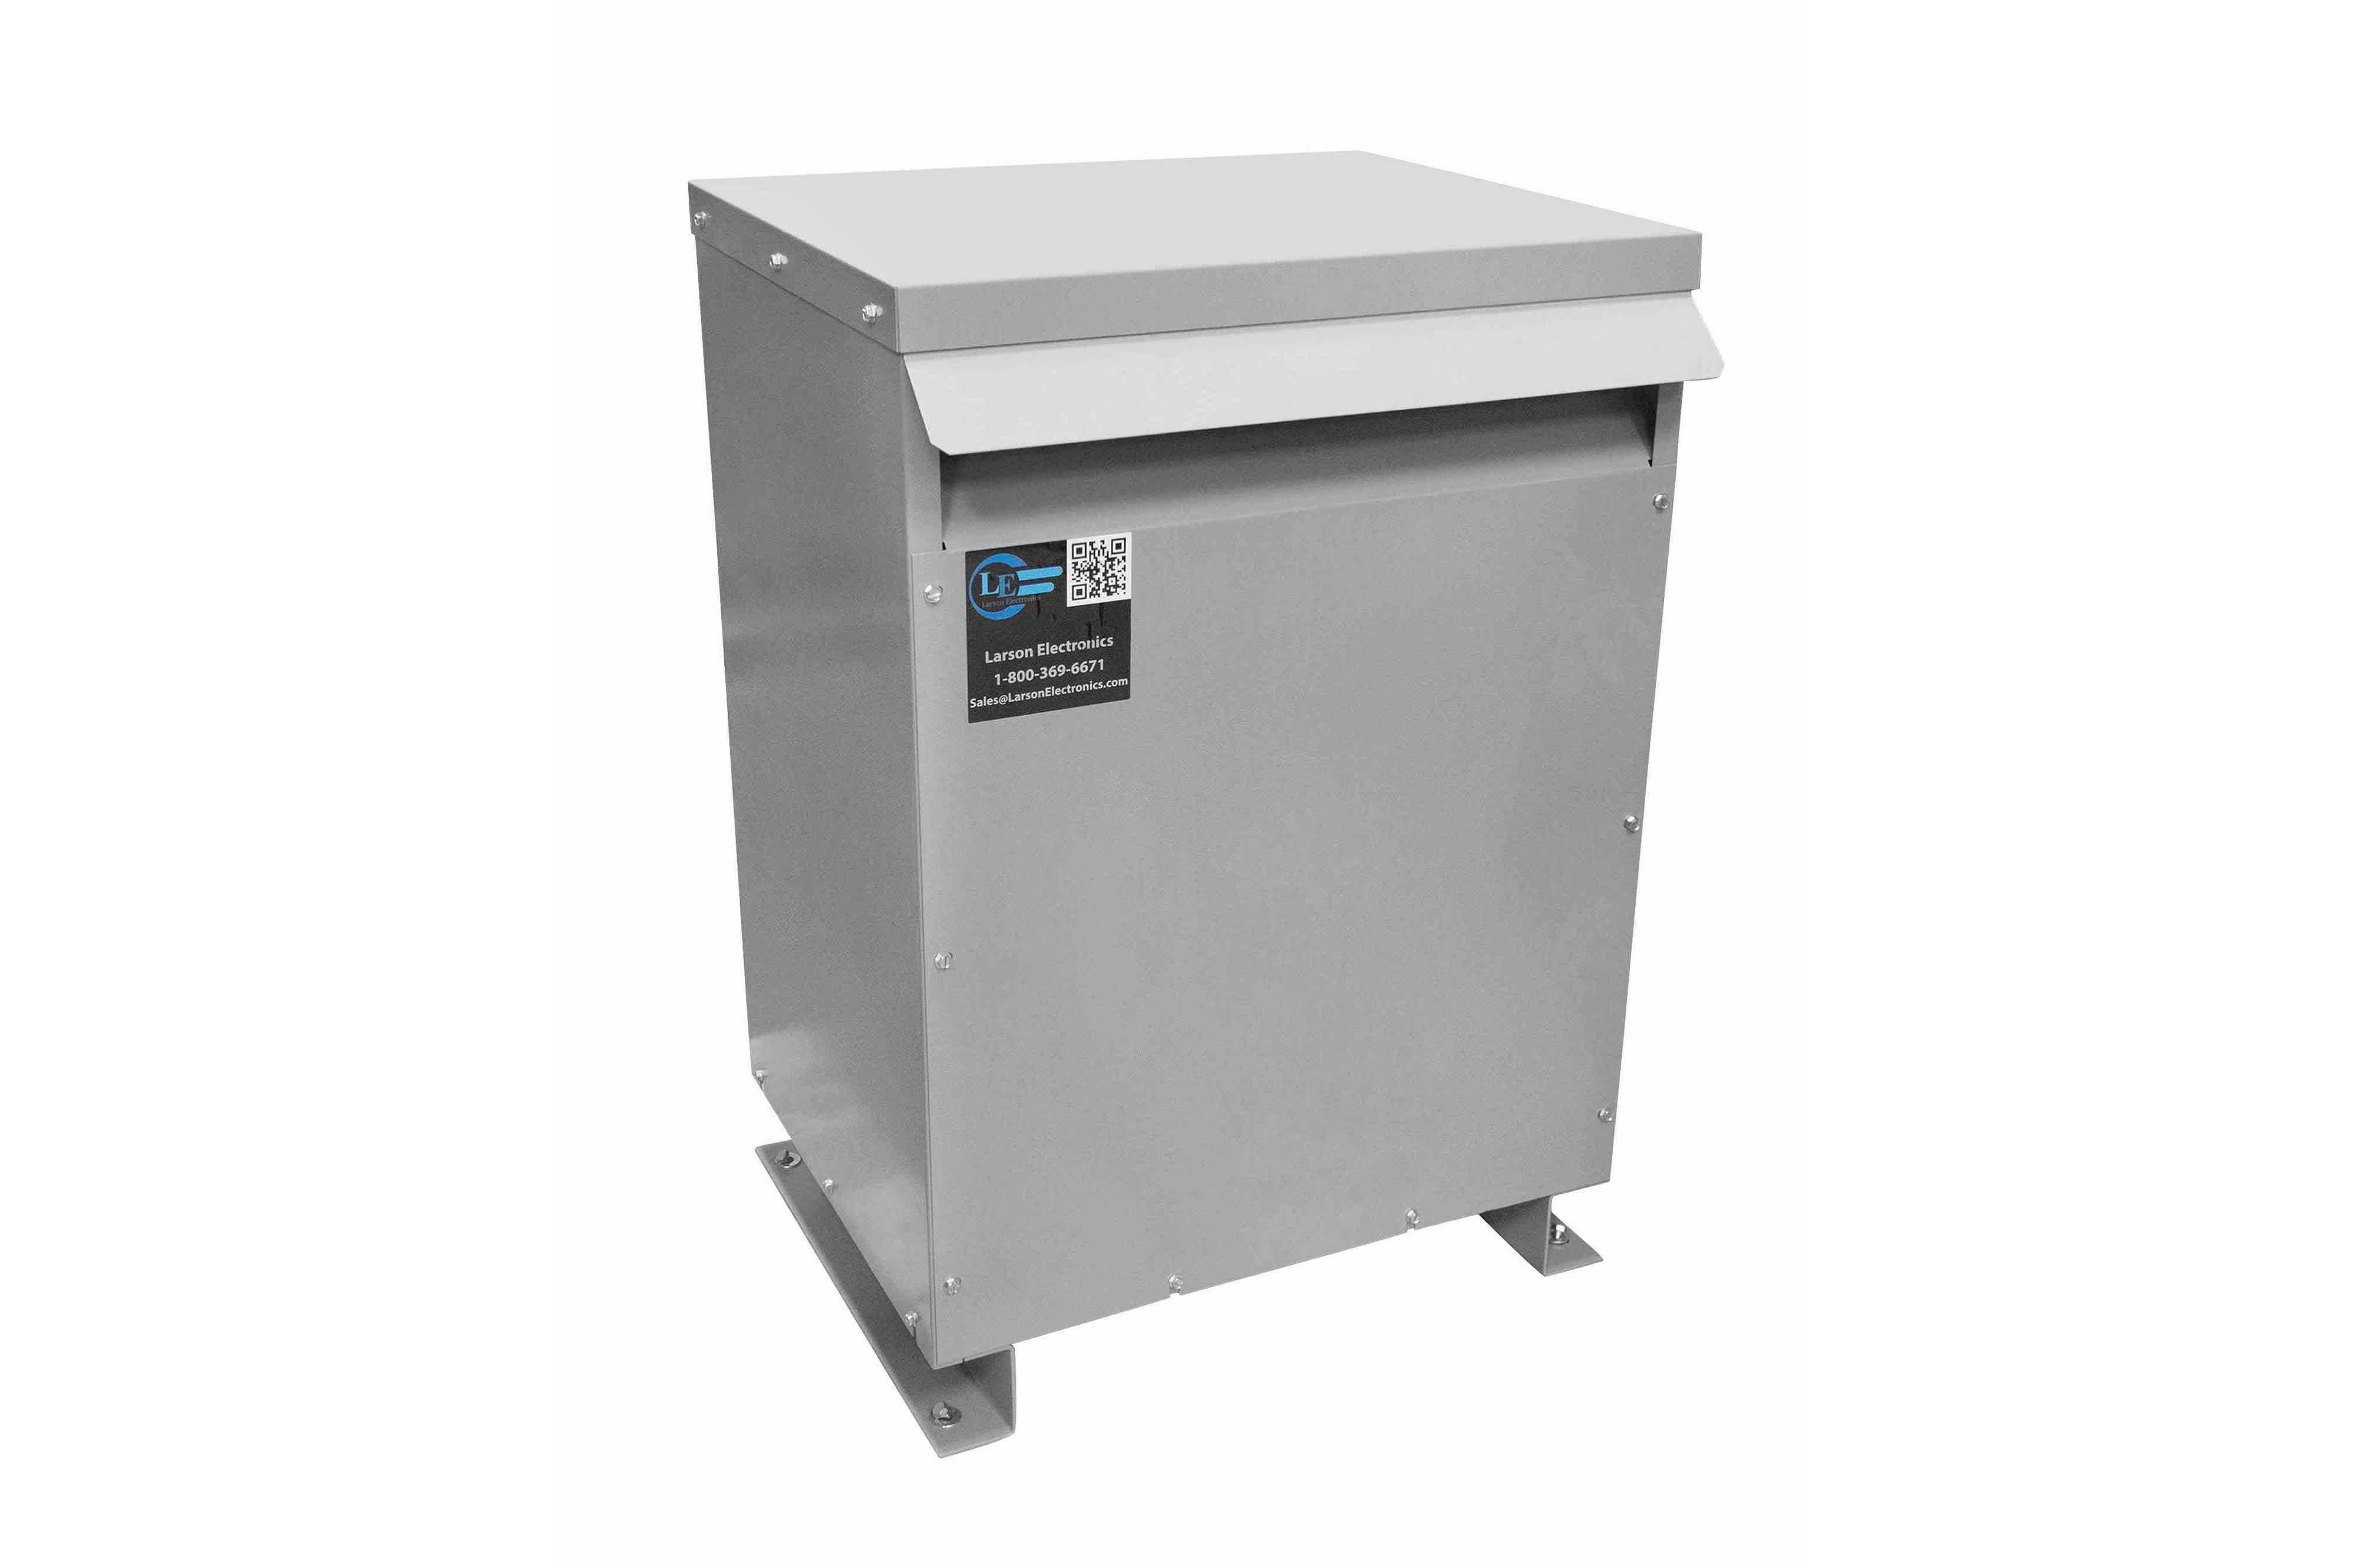 200 kVA 3PH Isolation Transformer, 240V Wye Primary, 380Y/220 Wye-N Secondary, N3R, Ventilated, 60 Hz